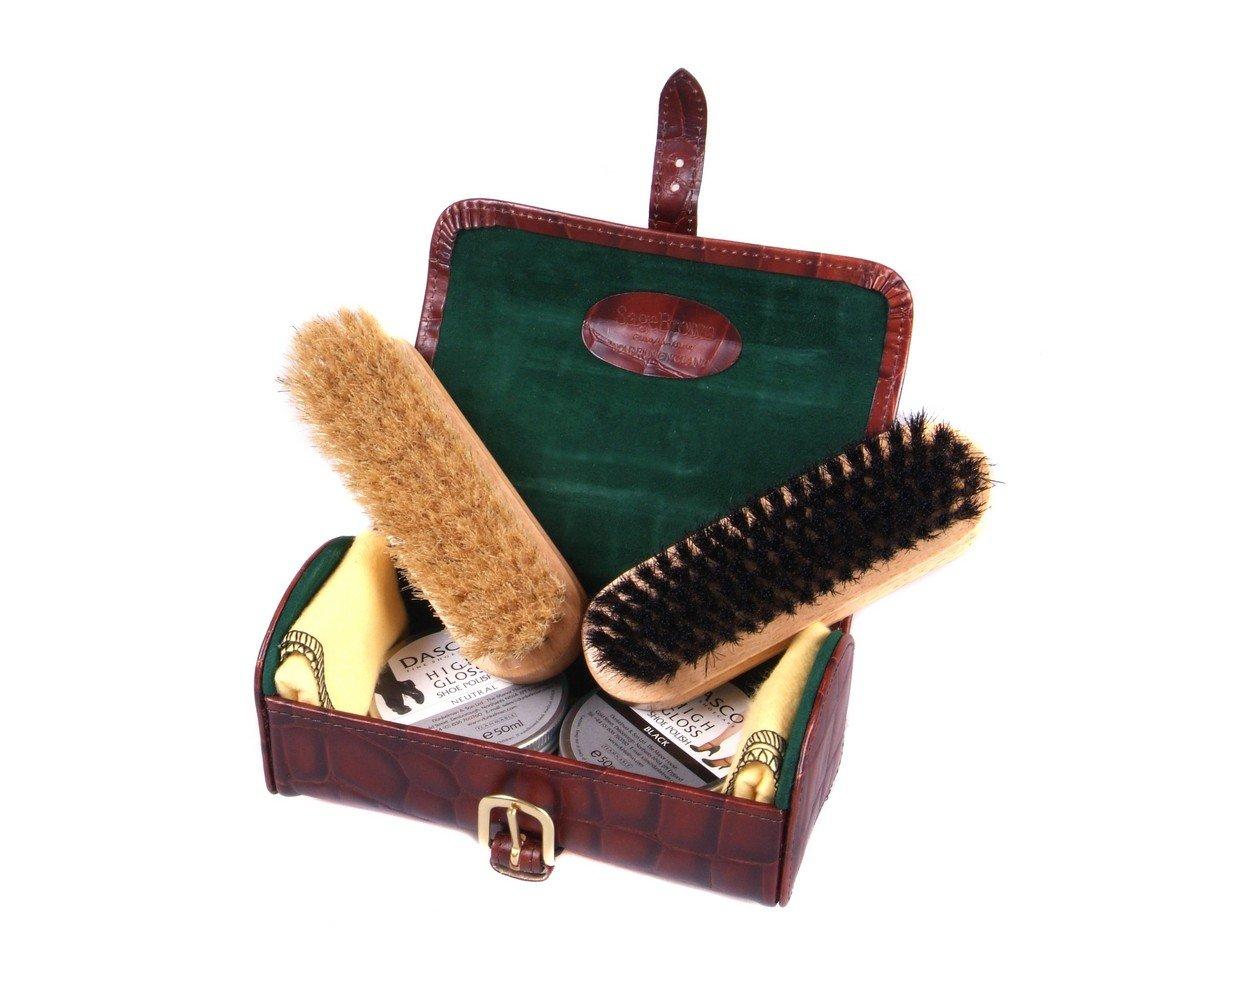 SAGEBROWN Brown Mississippi Croc Shoe Cleaning Kit